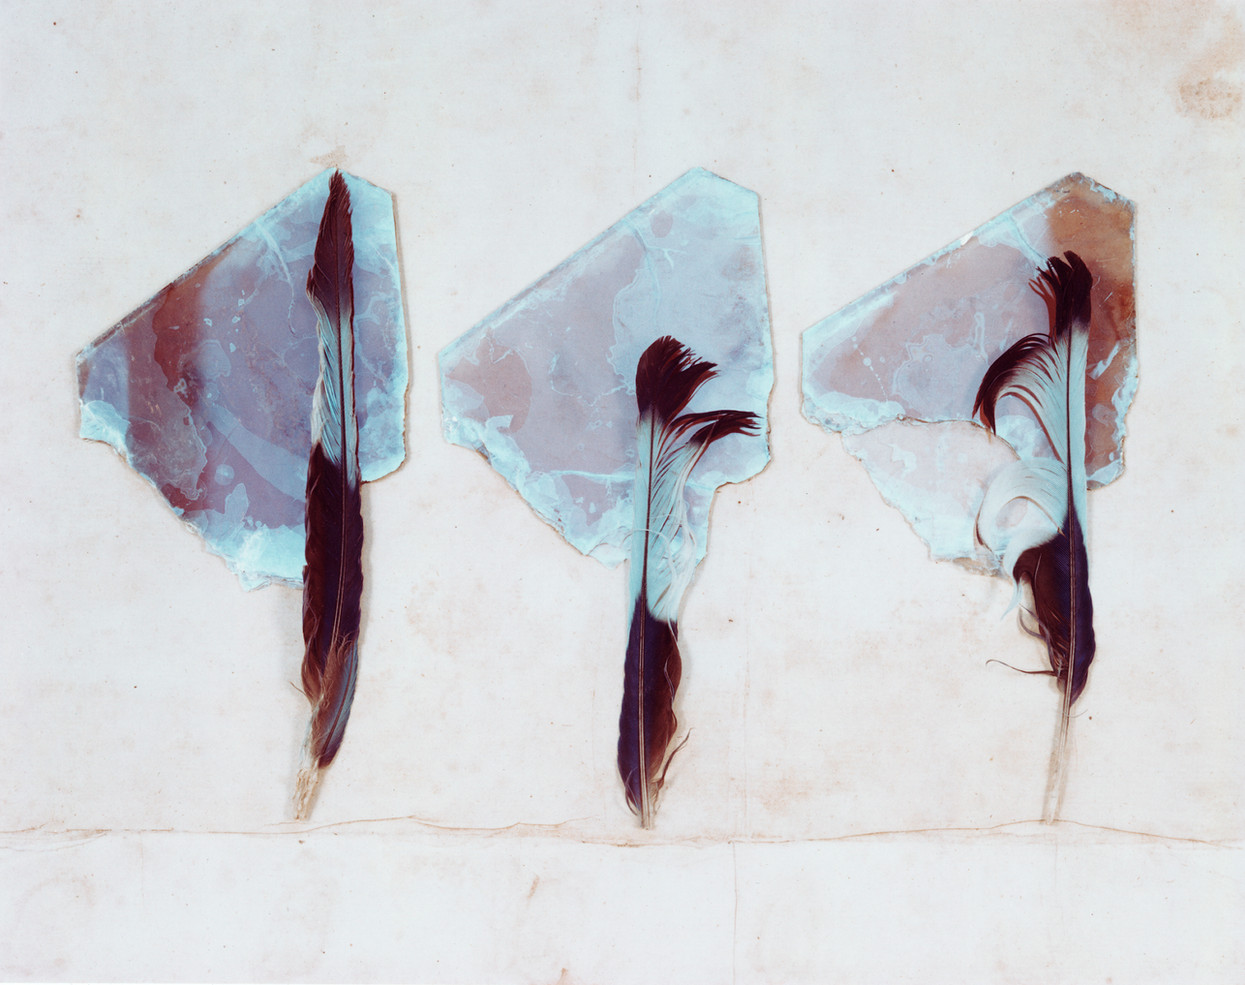 19_Three Feathers Three Crystals  1981.j